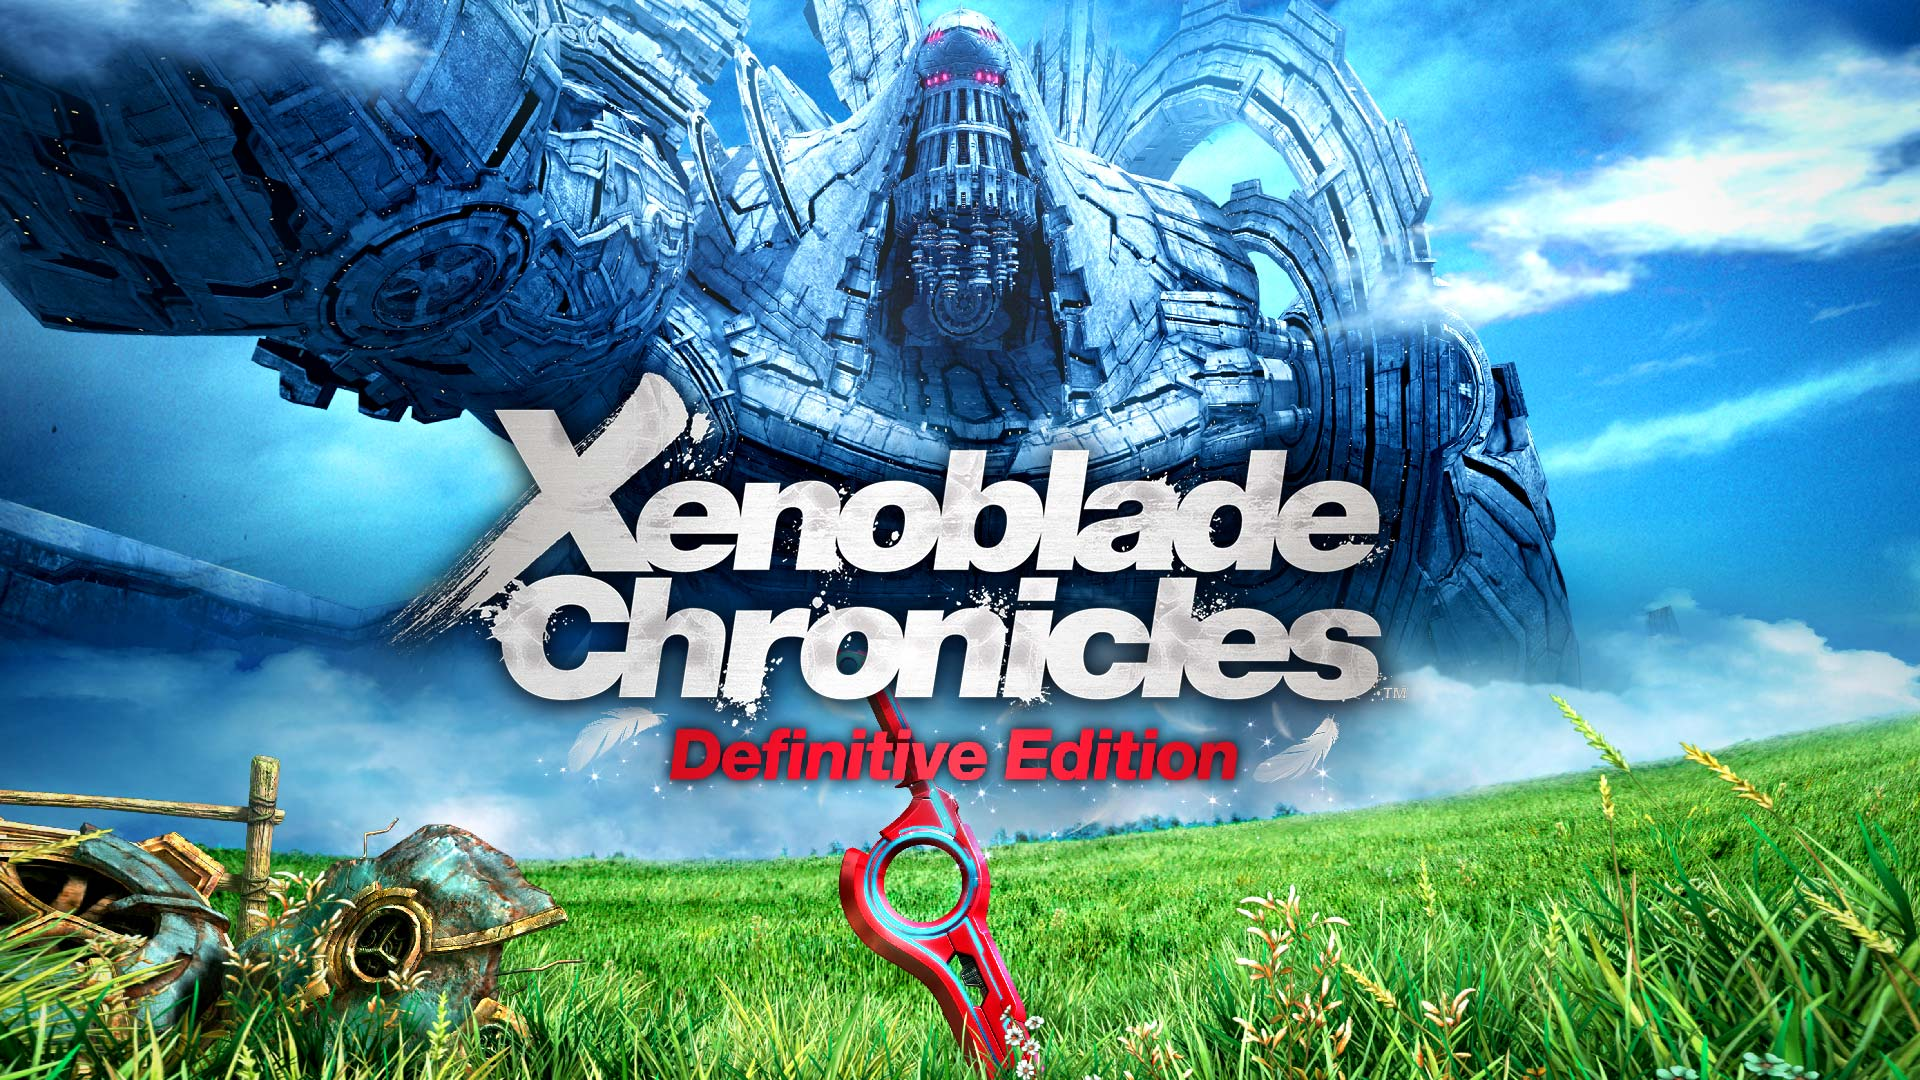 Jogos: Xenoblade Chronicles: Definitive Edition é lançado para Switch